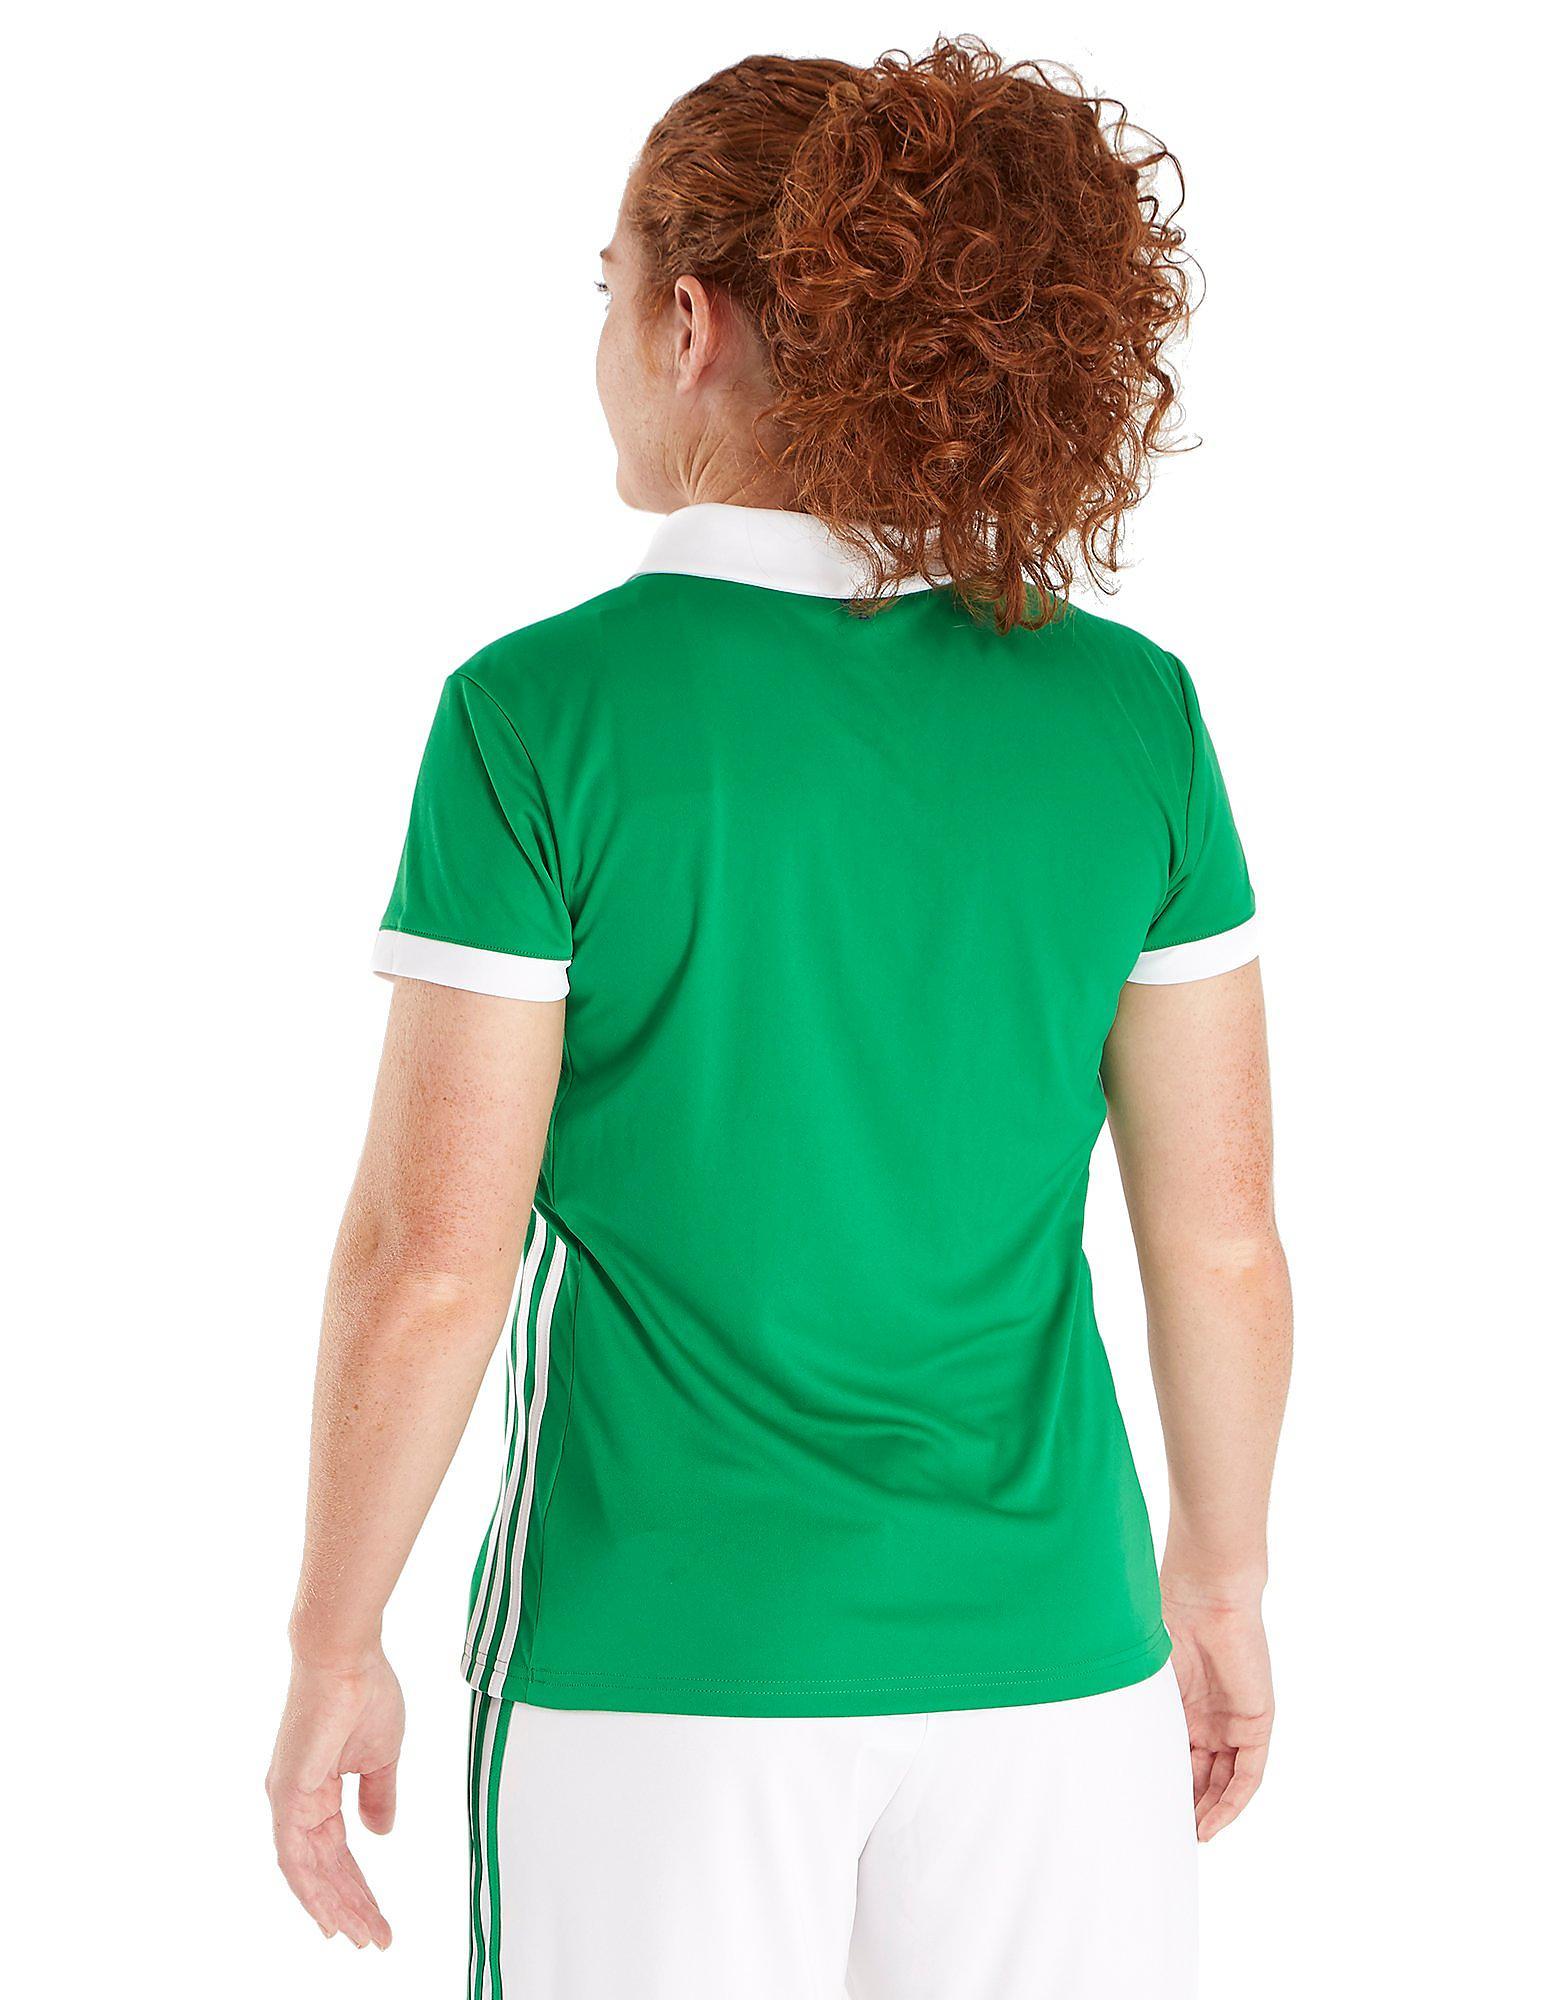 adidas Northern Ireland 2017/18 Home Shirt Women's